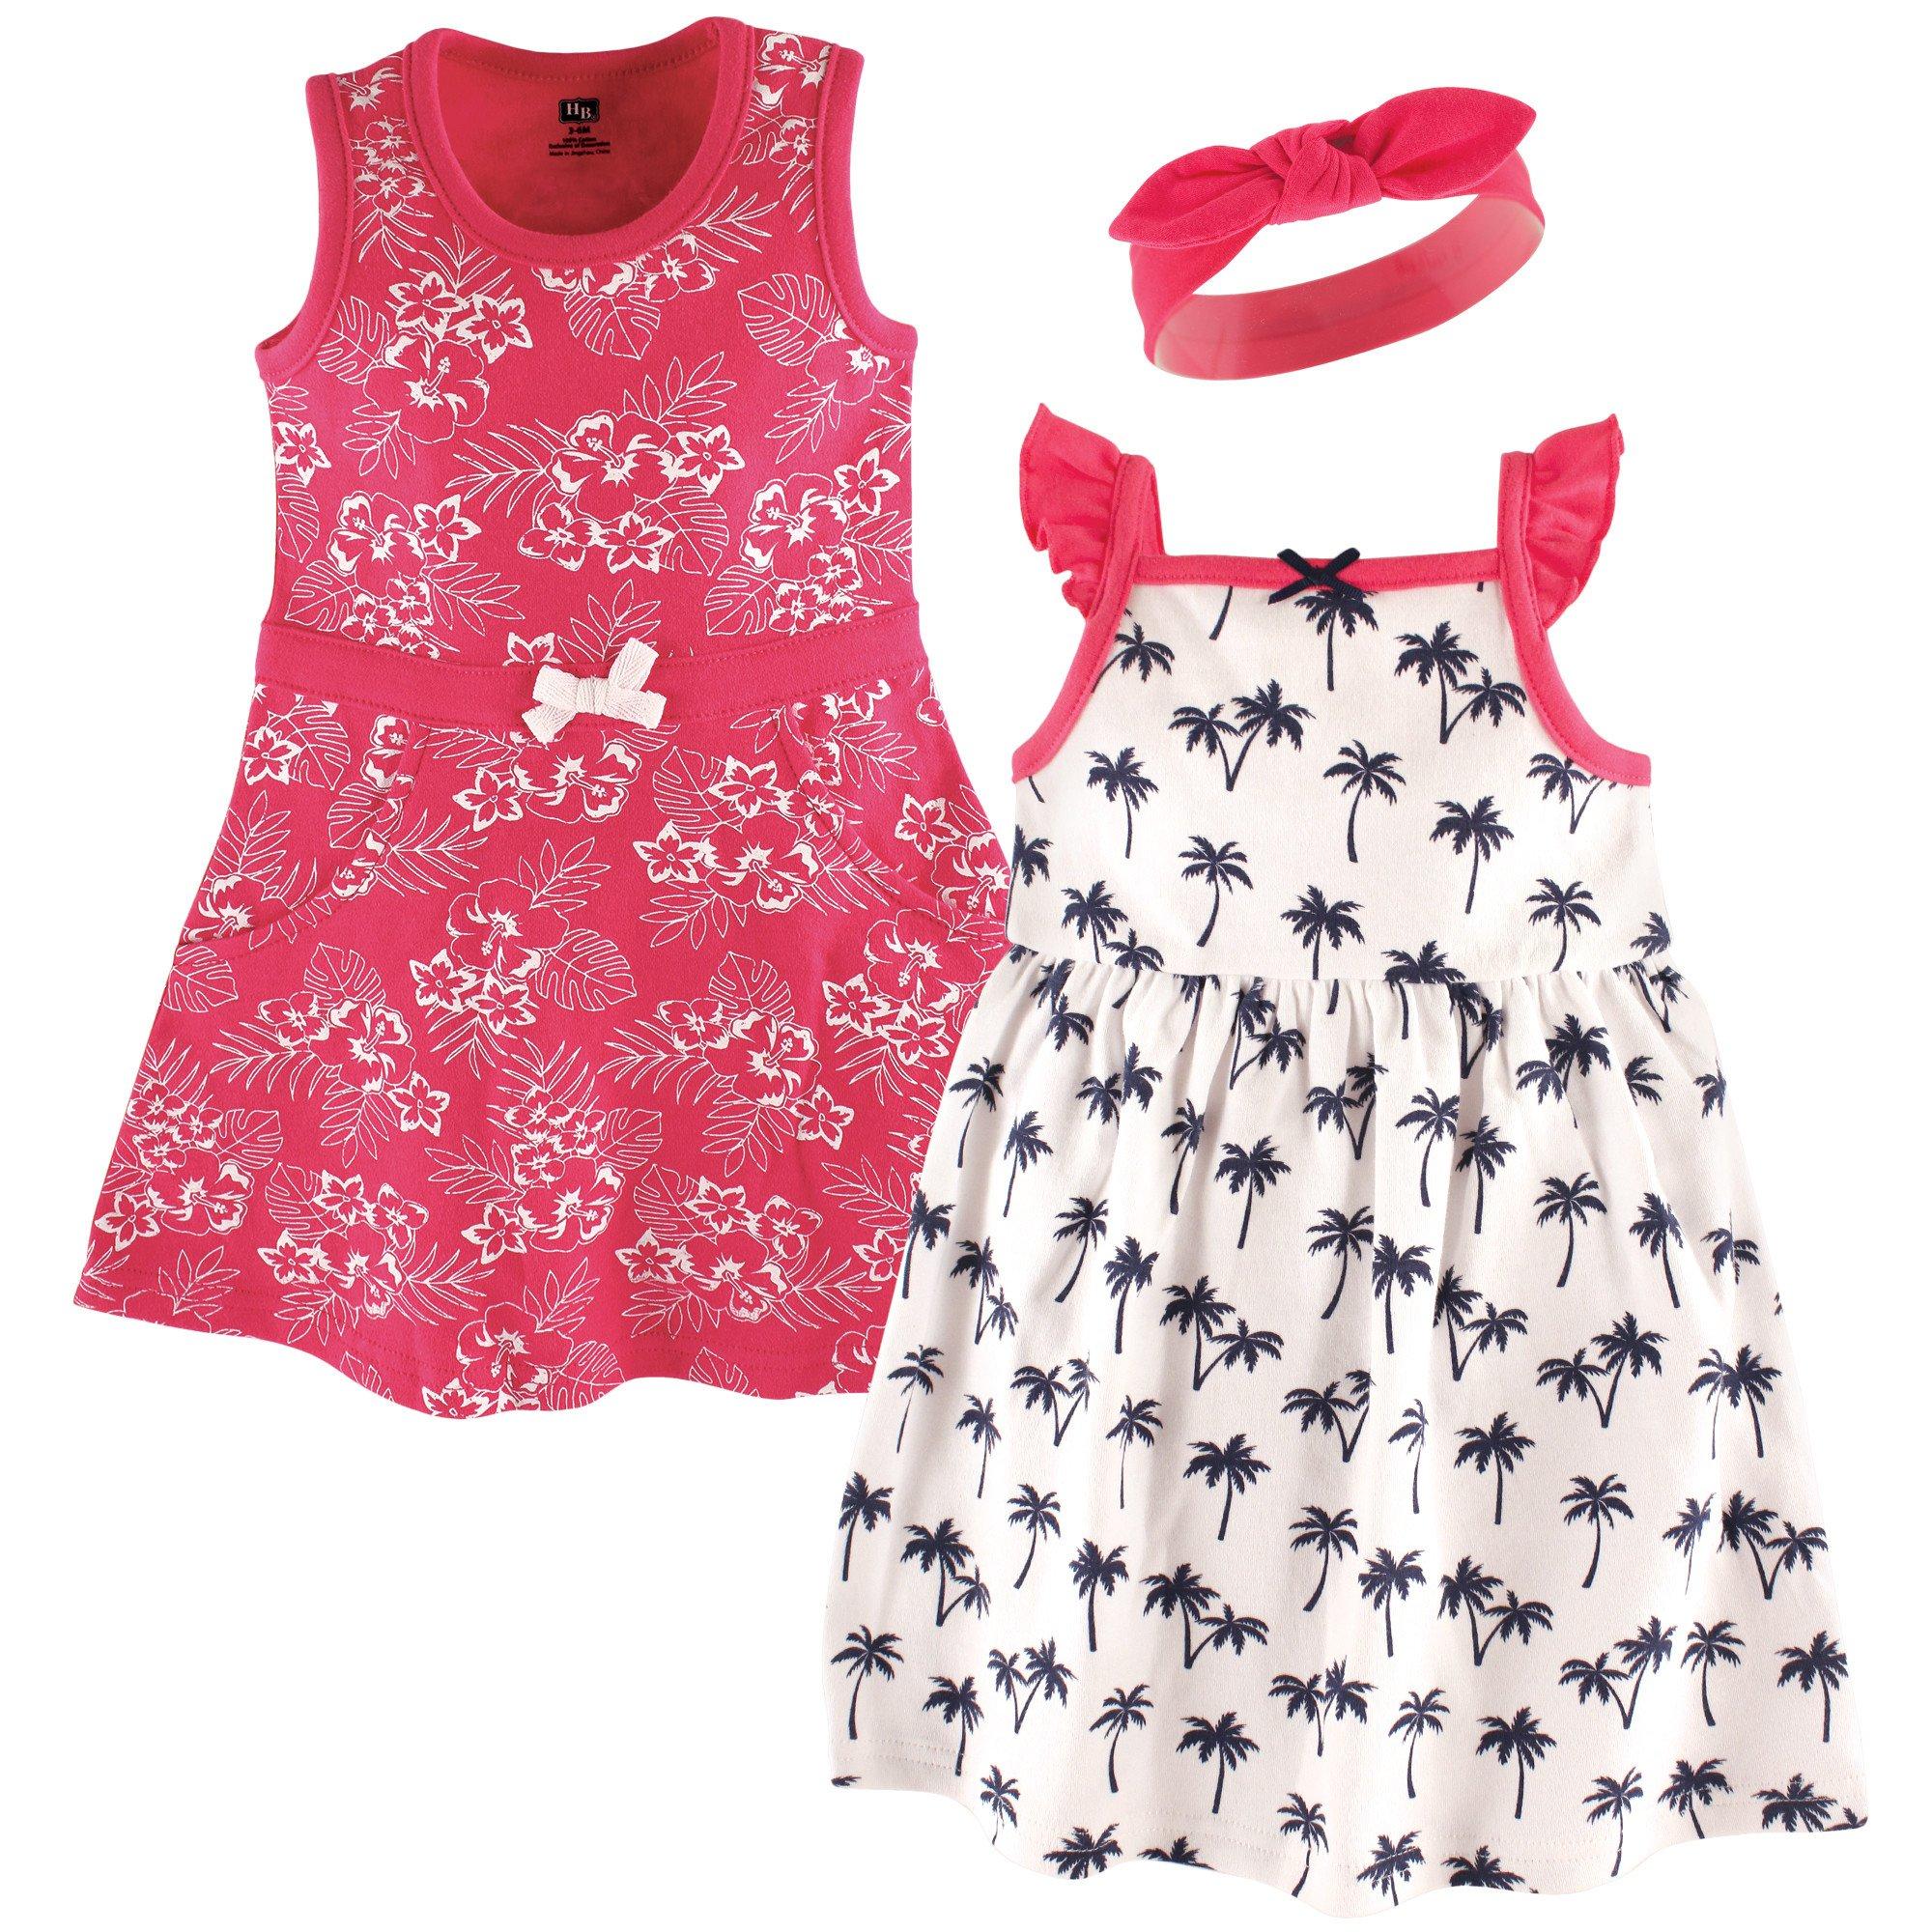 Hudson Baby Baby Girls 3 Piece Dress and Headband Set Playwear